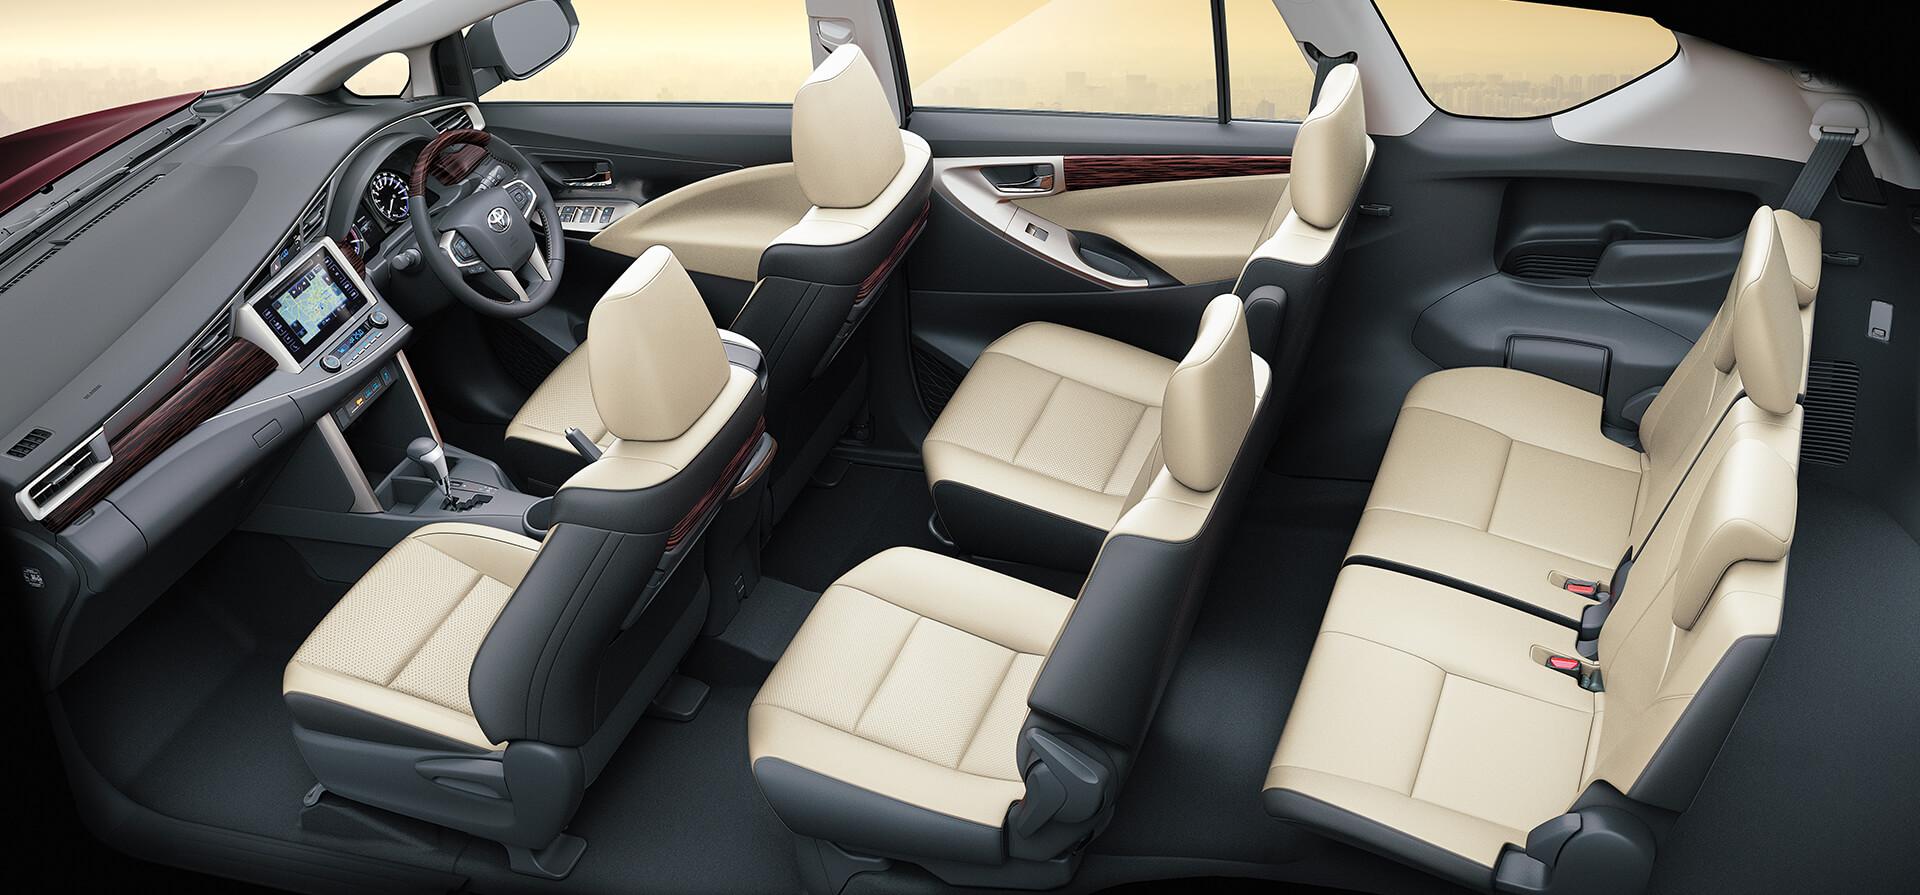 Toyota India | Official Toyota Innova Crysta site, Innova